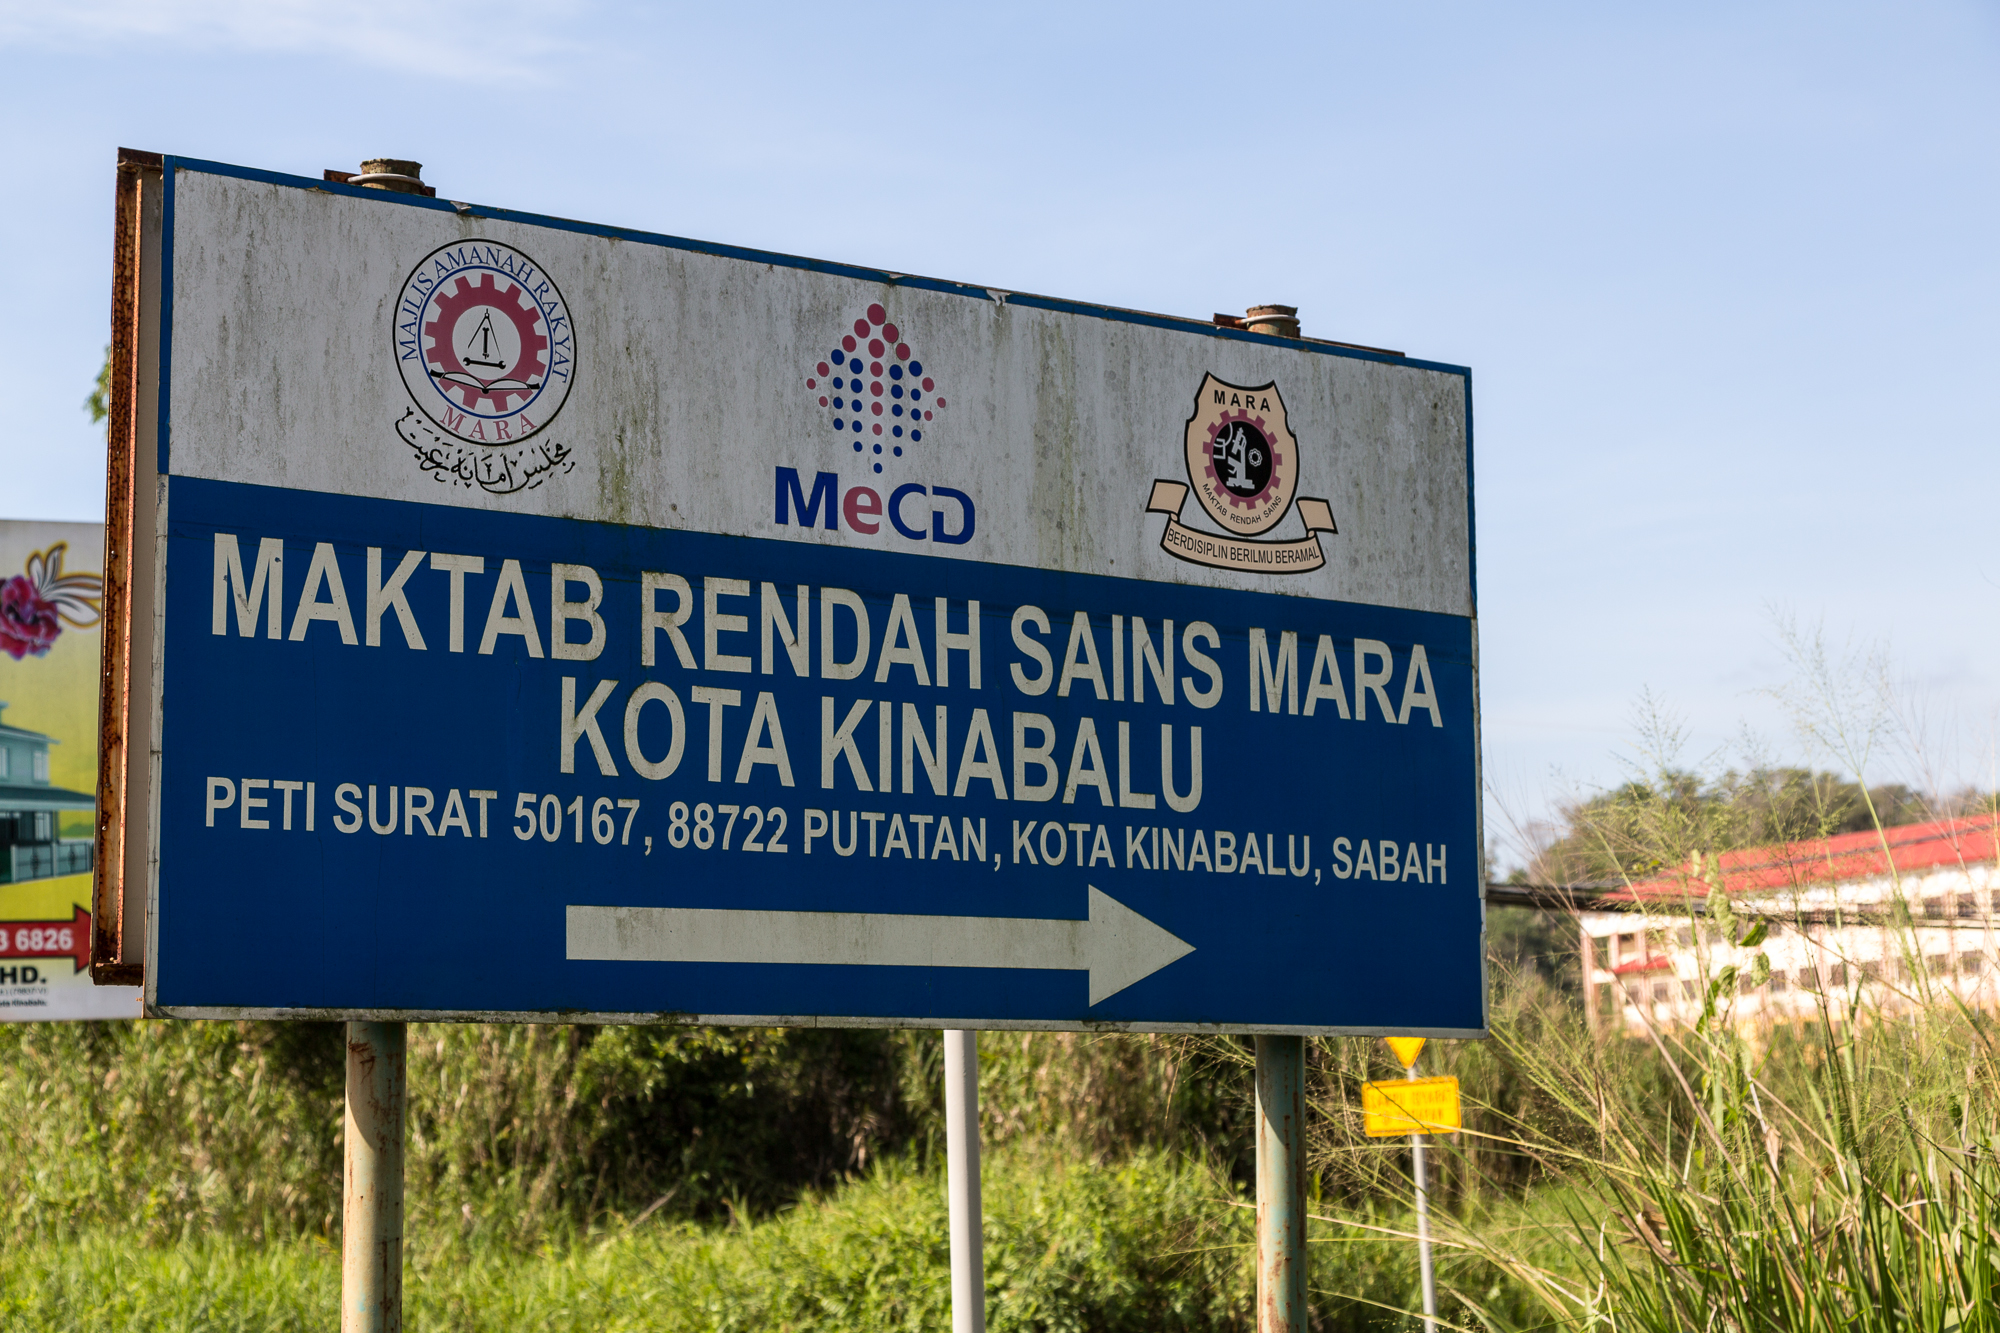 File Putatan Sabah Maktabrendahsainsmara 02 Jpg Wikimedia Commons